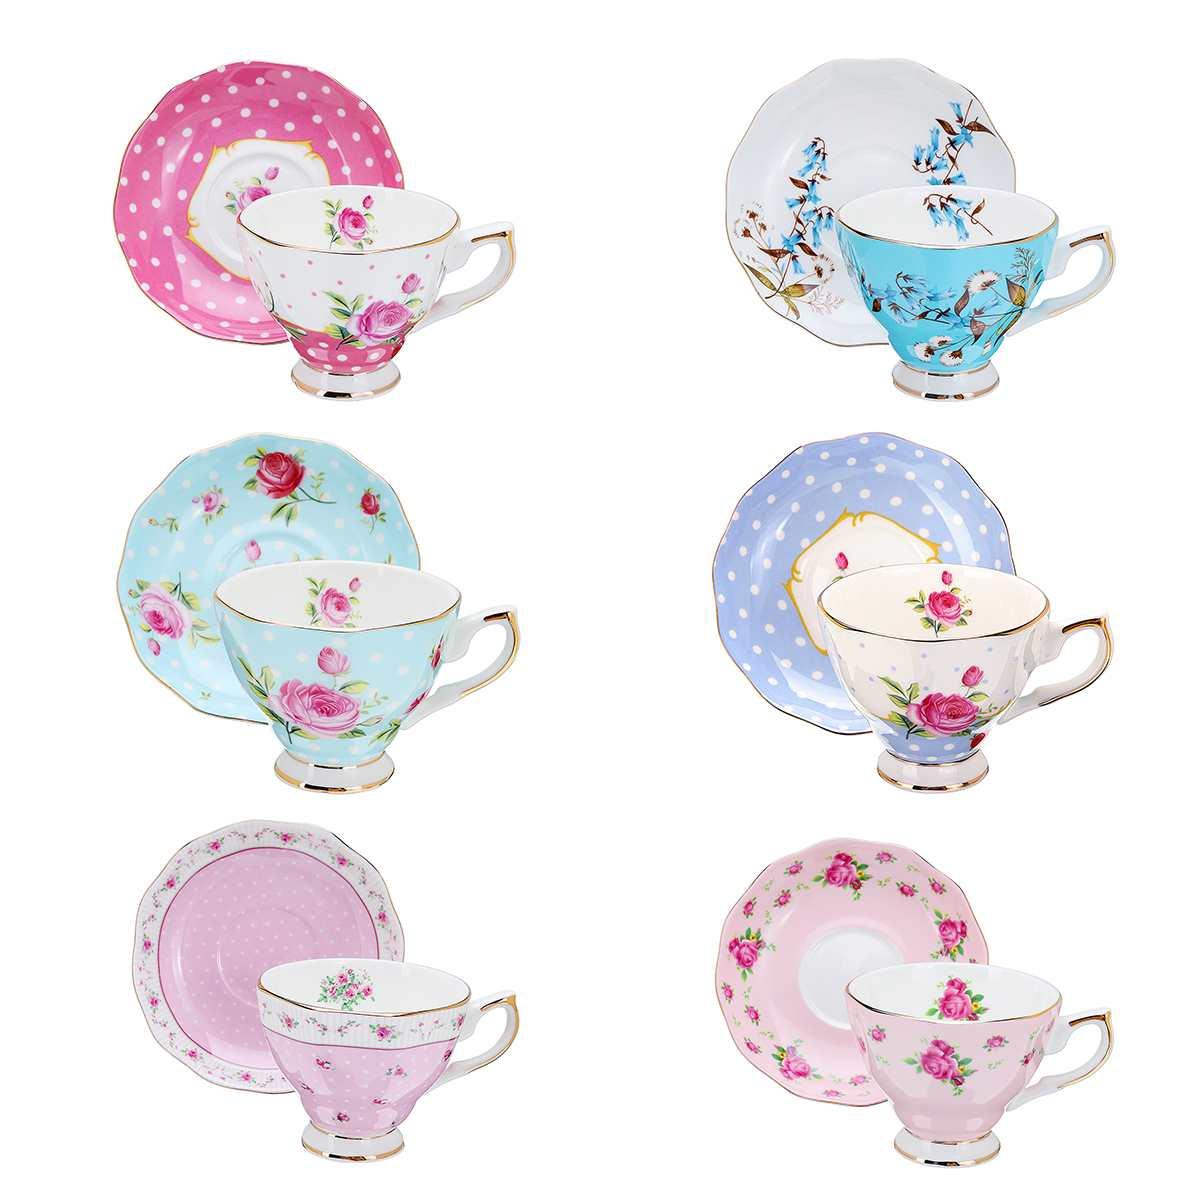 6 Style 240ml Blue Pink Porcelain Fashion British Bone China Coffee Cup Saucer Ceramic Flower Tea Set